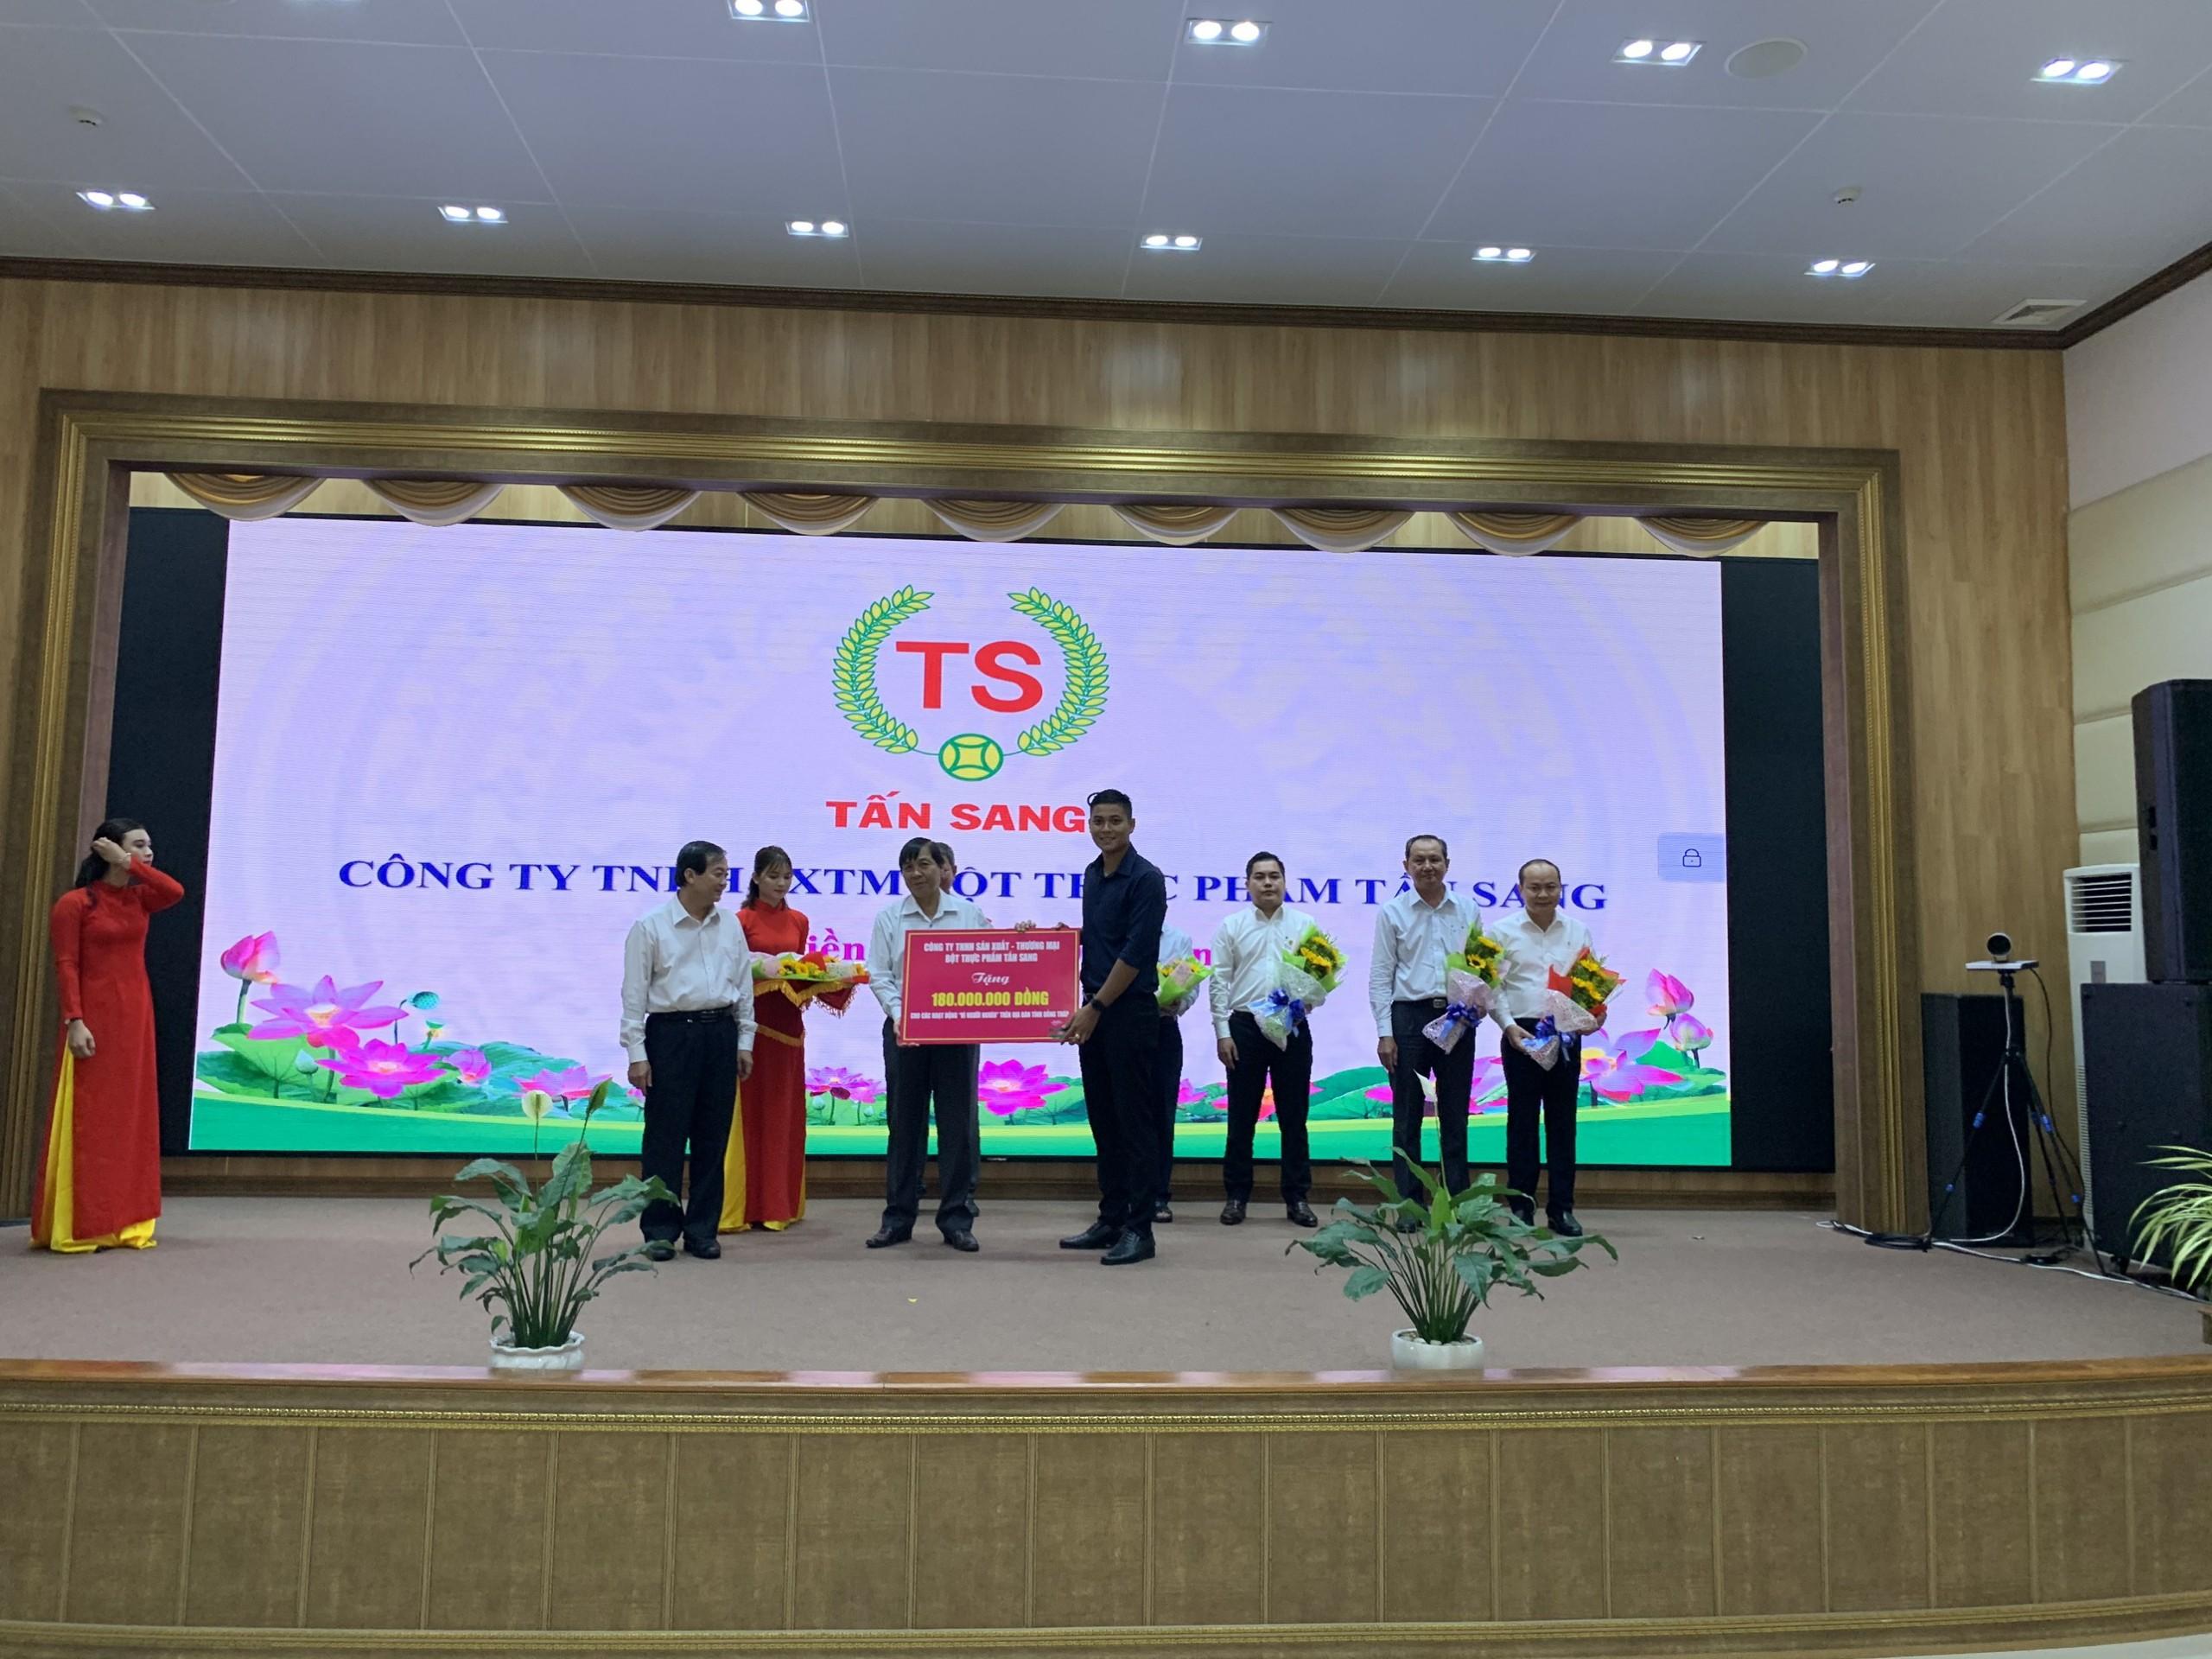 bot-thuc-pham-tan-sang-dong-hanh-cung-hoi-nghi-truc-tuyen-phat-dong-thang-cao-diem-vi-nguoi-ngheo-17-10-18-11-2019-90